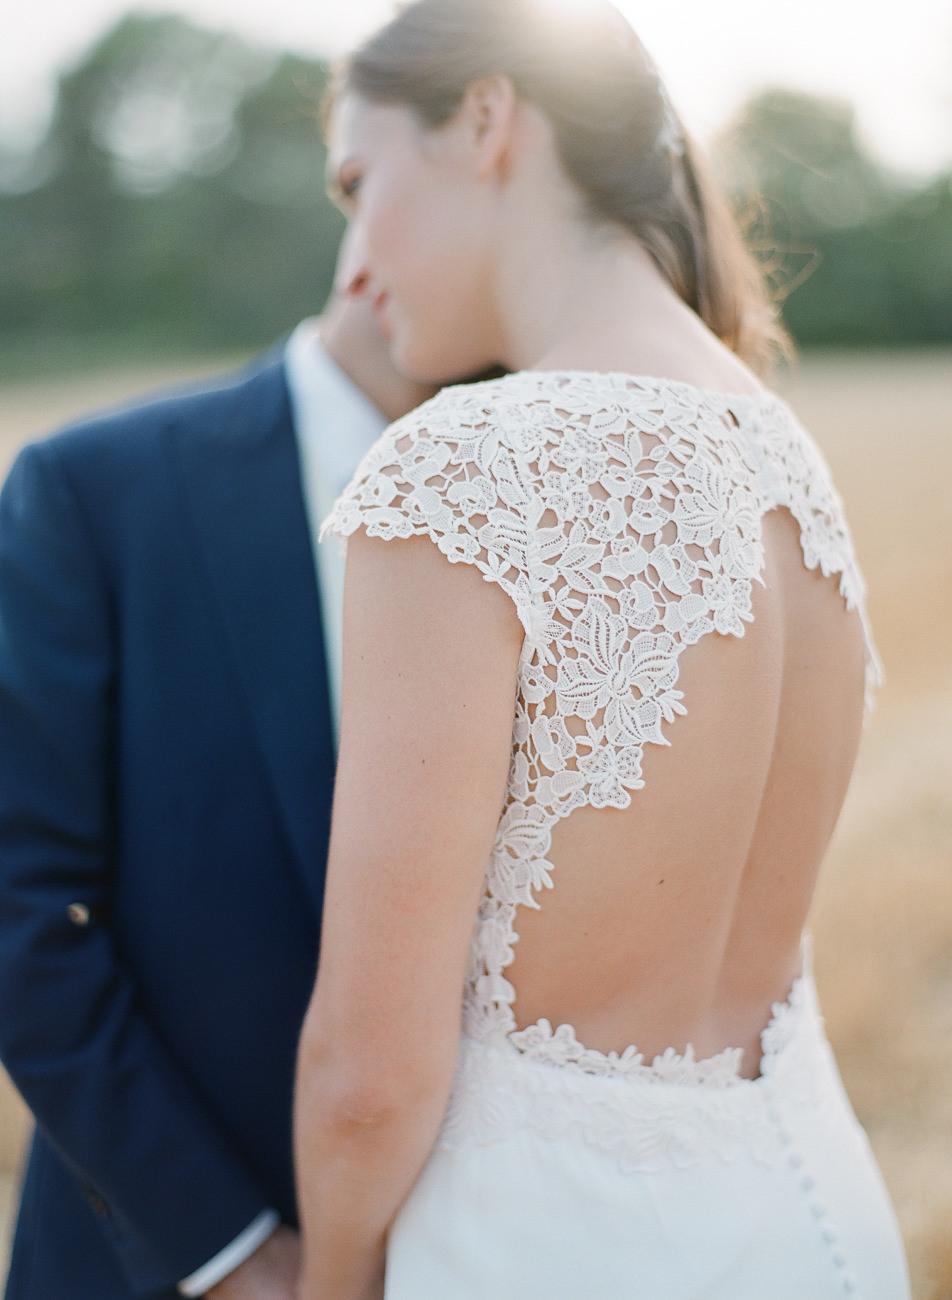 chateau-valmousse-photographe-mariage-alain-m-26.jpg